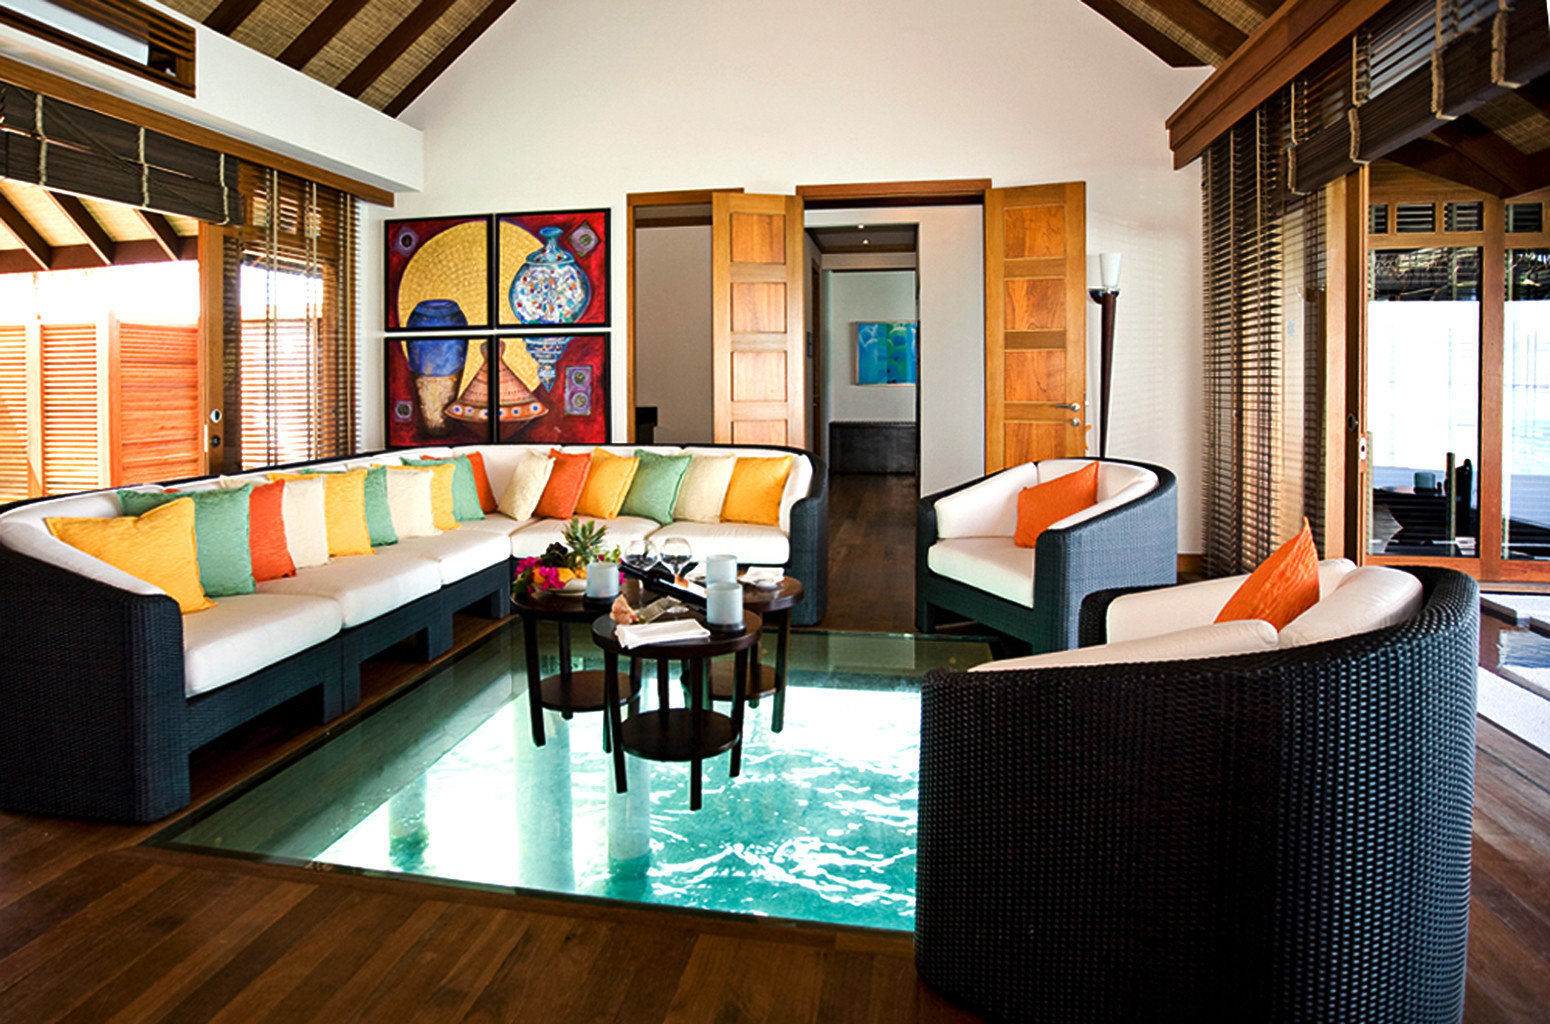 Elegant Lounge Luxury Modern Scenic views property chair living room recreation room home Resort condominium Suite Villa cottage